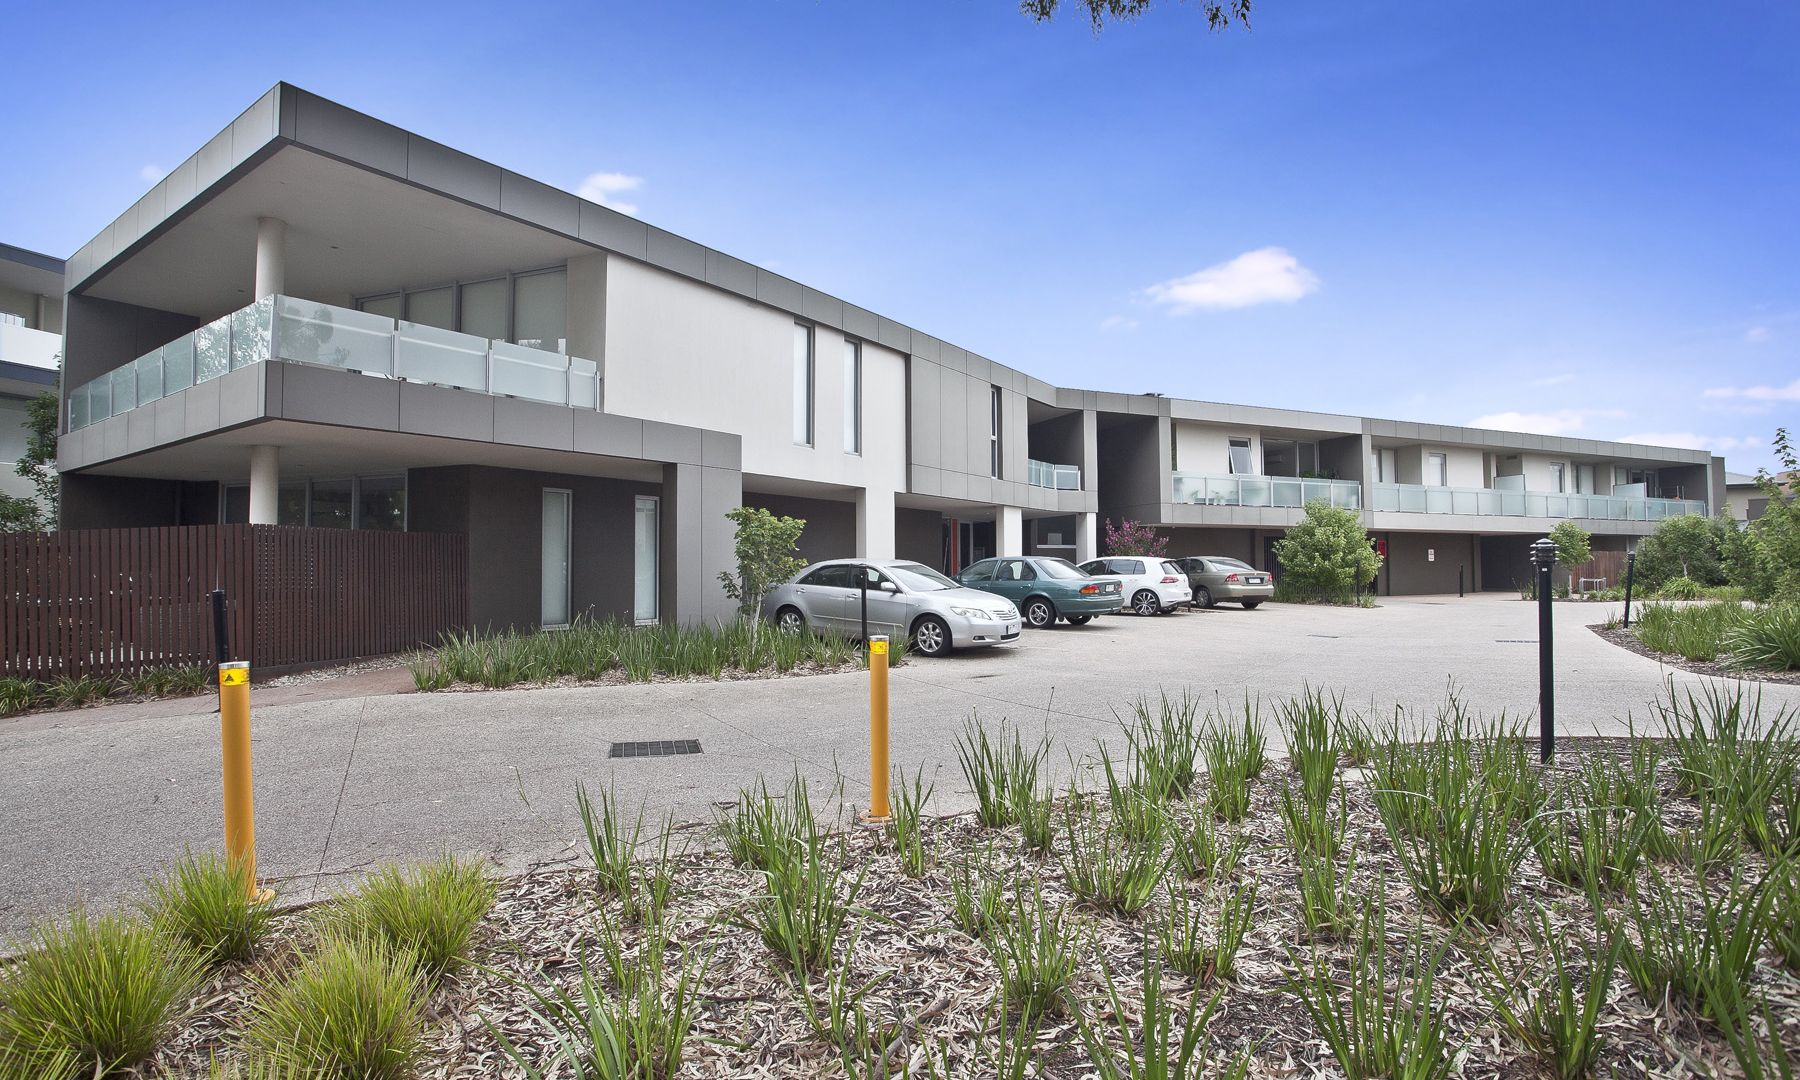 2/42 Eucalyptus Drive, Maidstone VIC 3012, Image 1